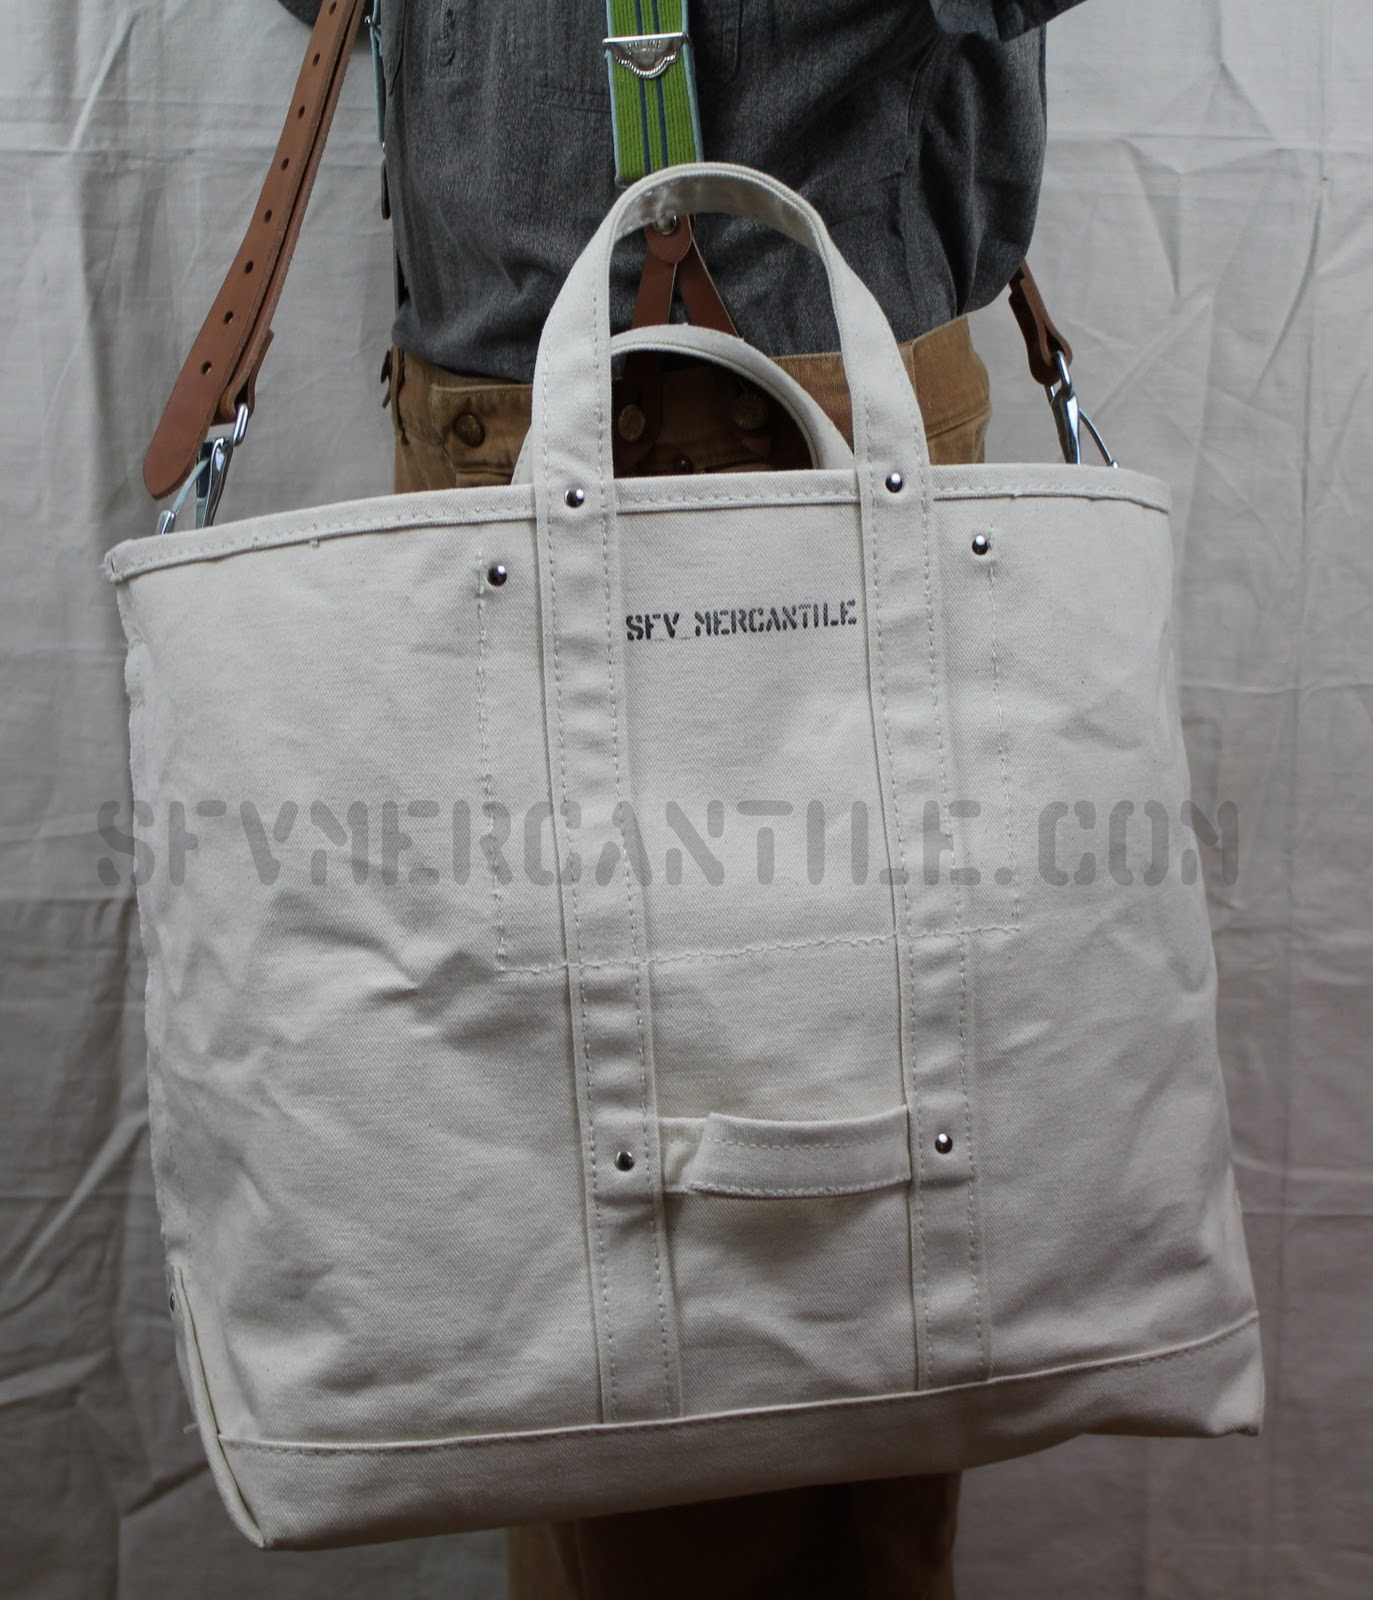 vintage workwear: The San Fernando Valley Mercantile Co ...